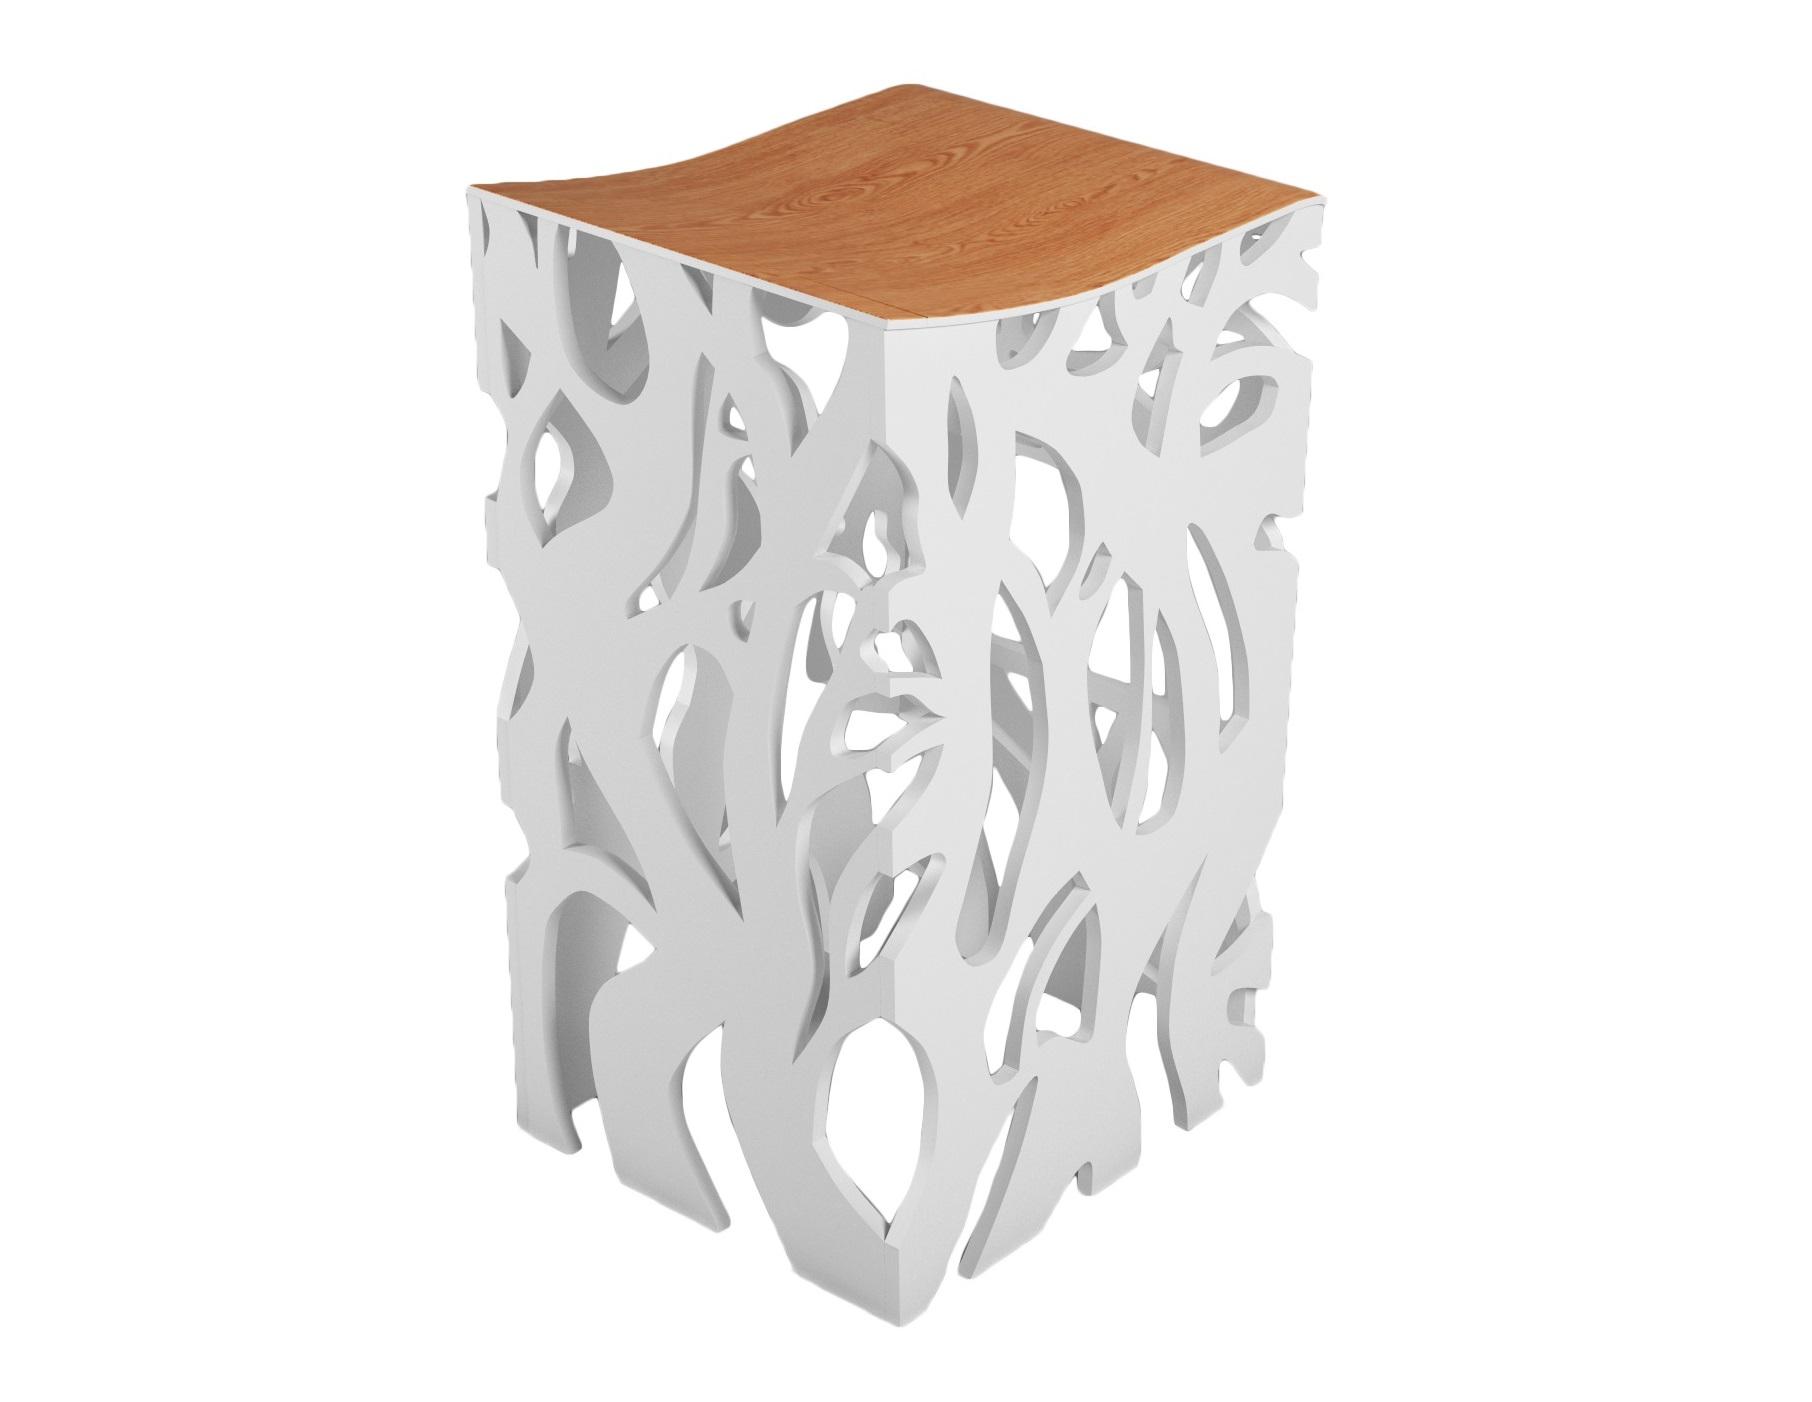 Барный стул ПлющБарные стулья<br>Барный стул дизайна ODINGENIY перевернет ваше представление о барных стульях&amp;amp;nbsp;&amp;lt;div&amp;gt;&amp;lt;br&amp;gt;&amp;lt;/div&amp;gt;&amp;lt;div&amp;gt;Материал: МДФ, шпон&amp;amp;nbsp;&amp;lt;/div&amp;gt;<br><br>Material: МДФ<br>Width см: 40<br>Depth см: 52<br>Height см: 84